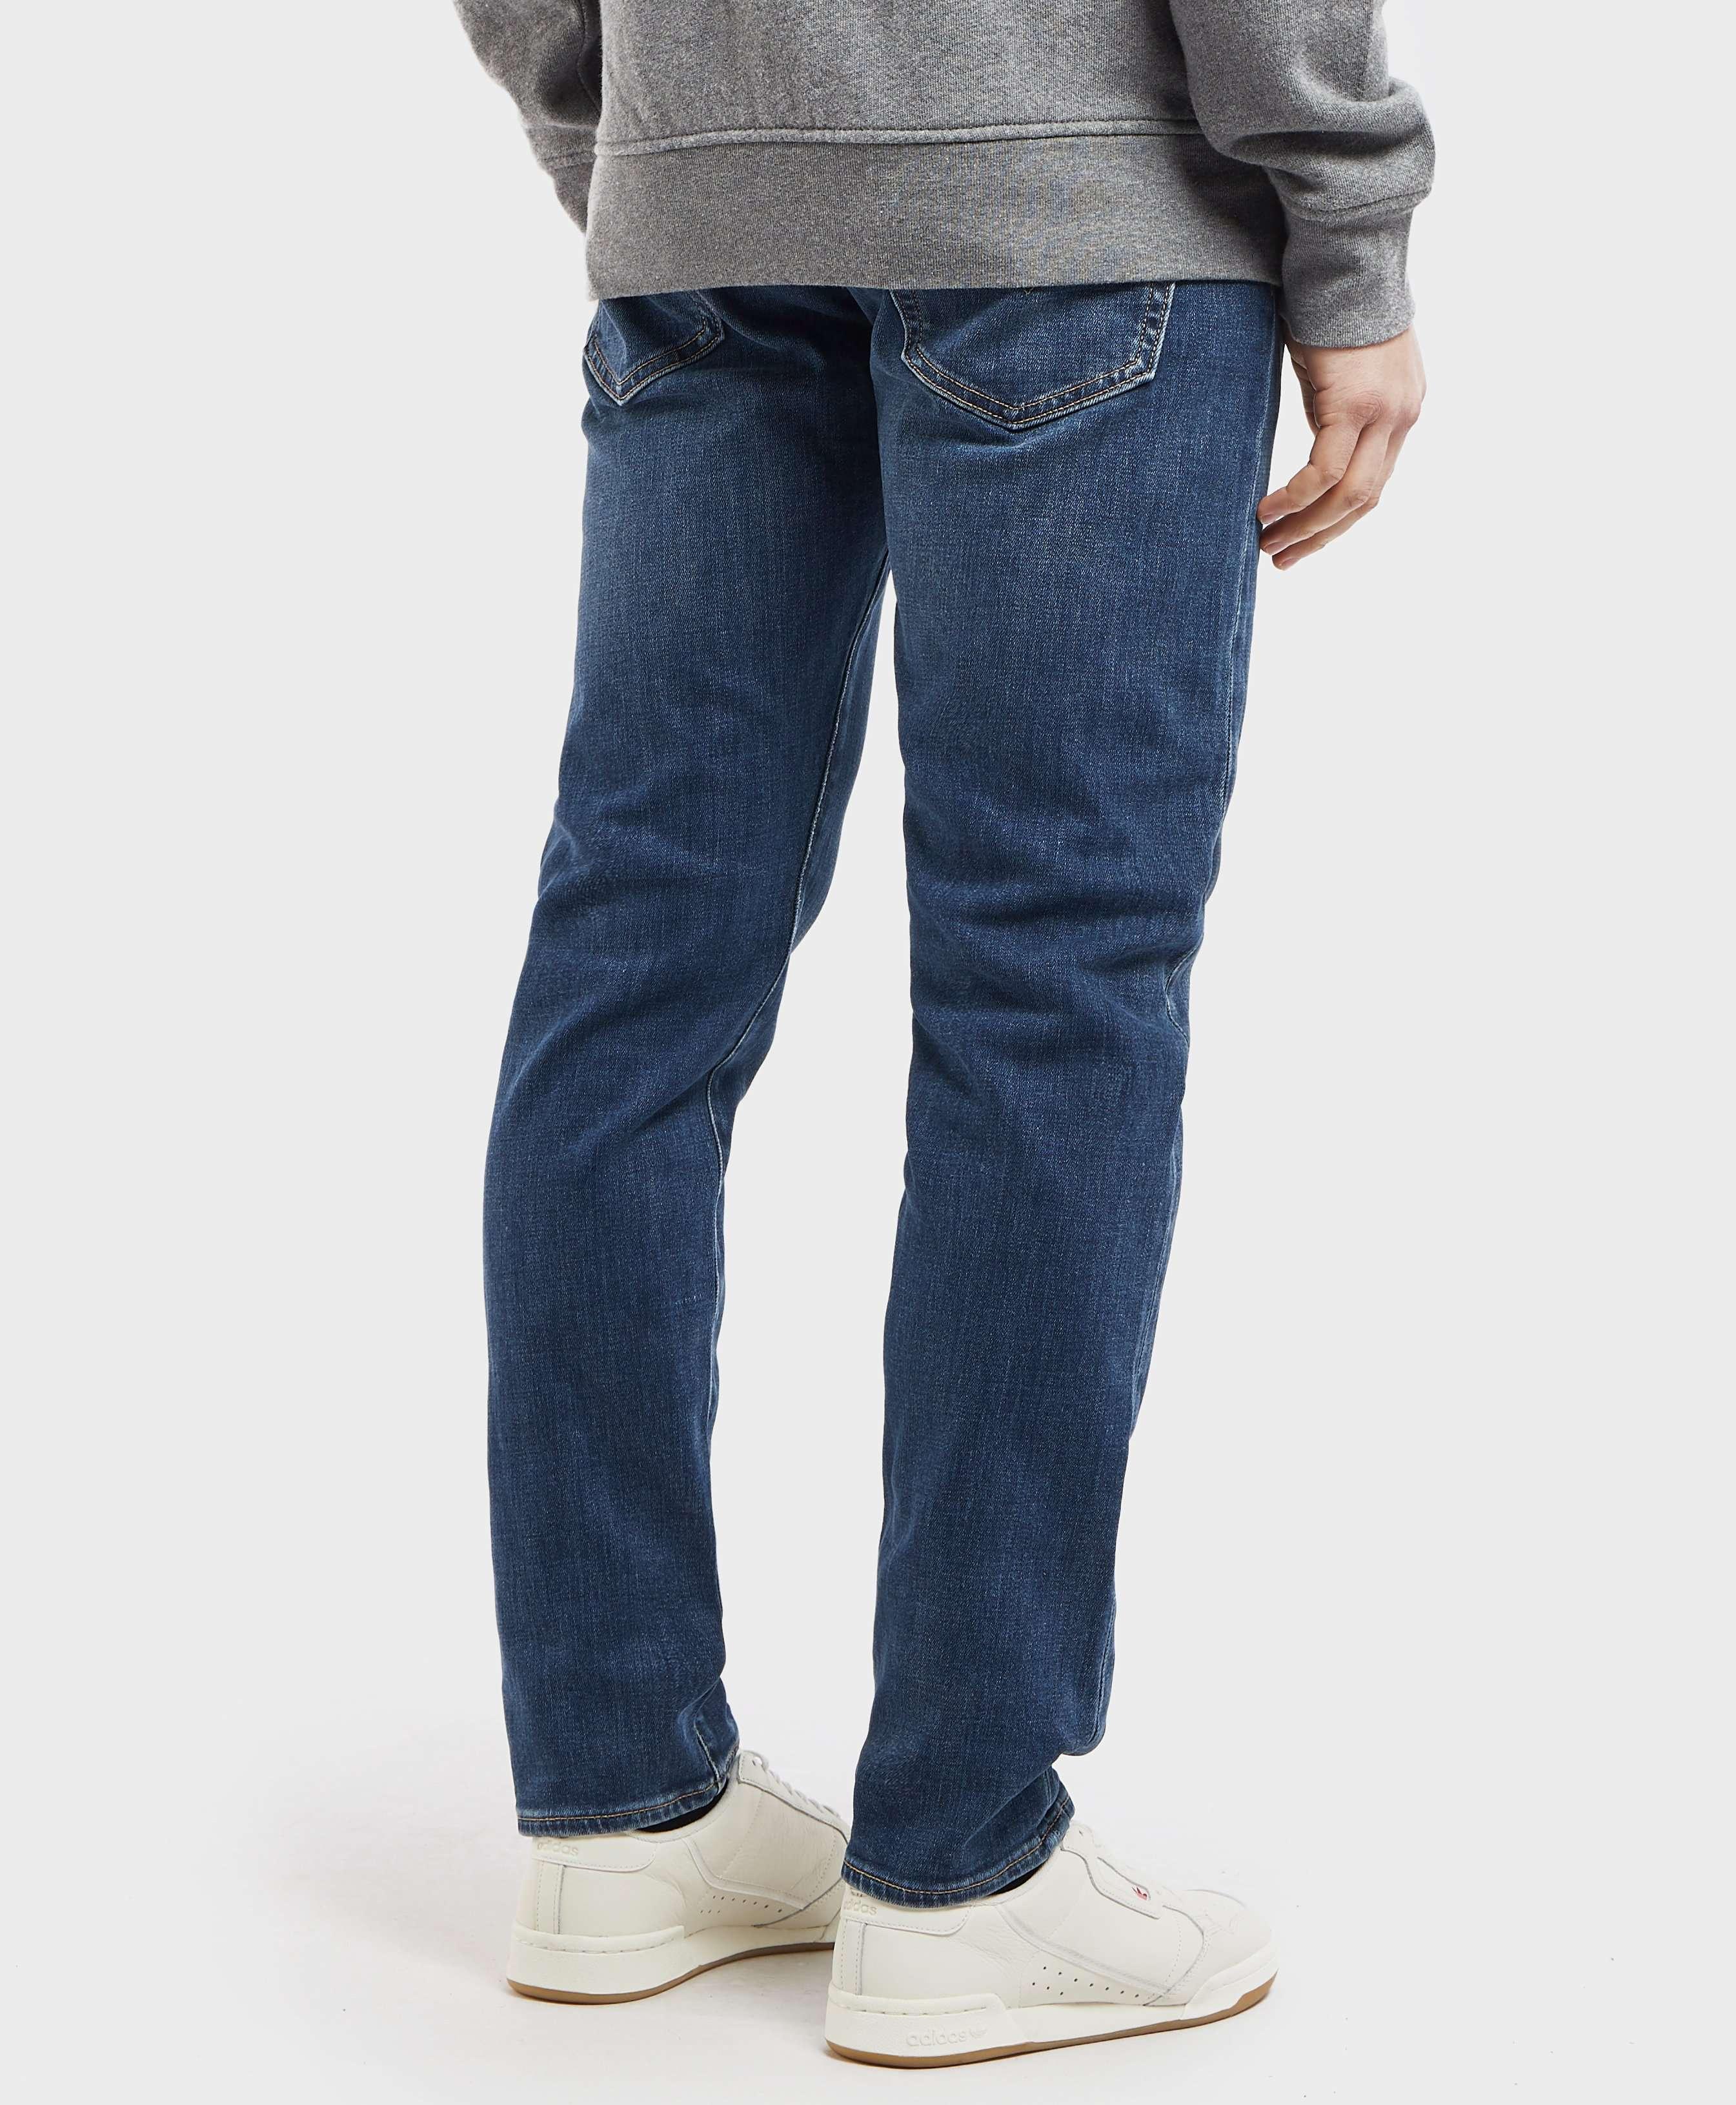 Levis 502 Regular Tapered Jeans - Online Exclusive